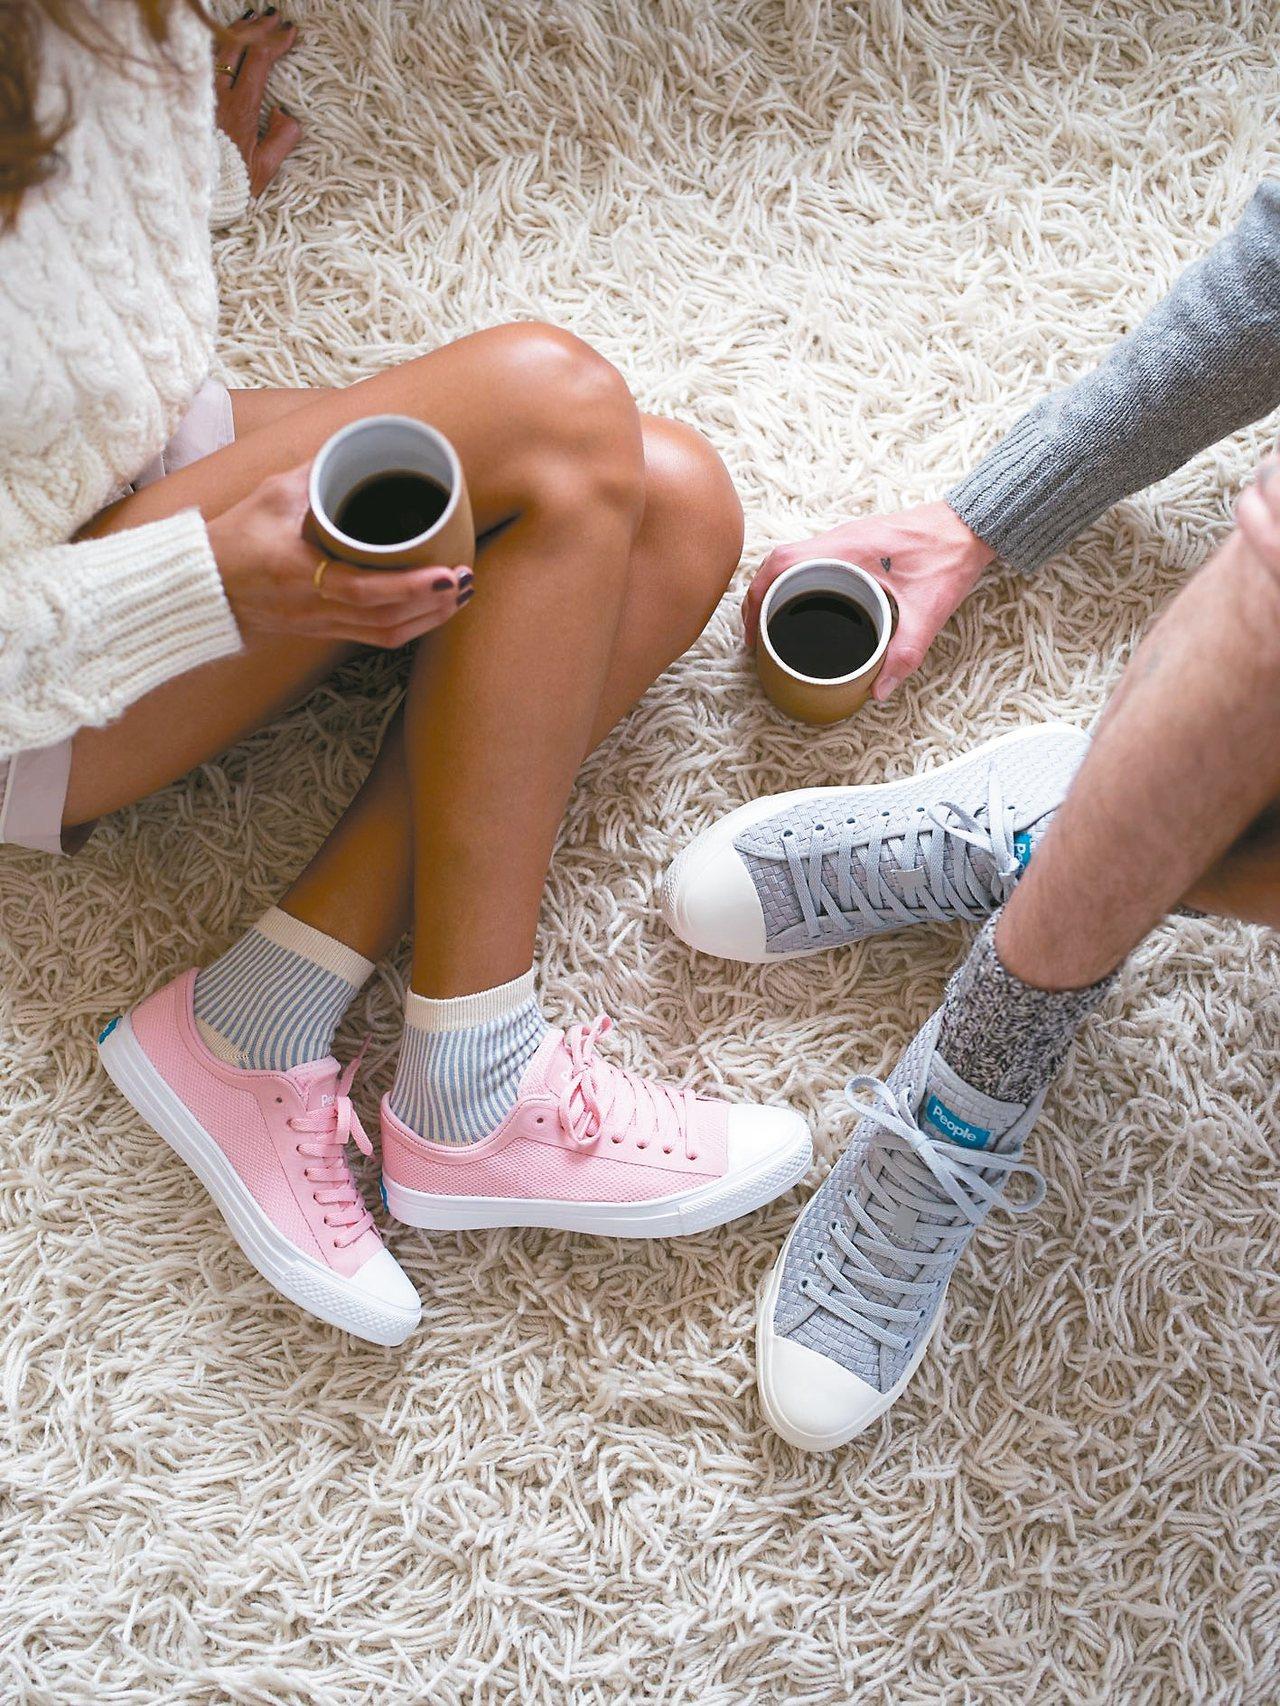 People FOOTWEAR運用科技輕量材質與經典元素連結打造輕盈舒適的休閒鞋。